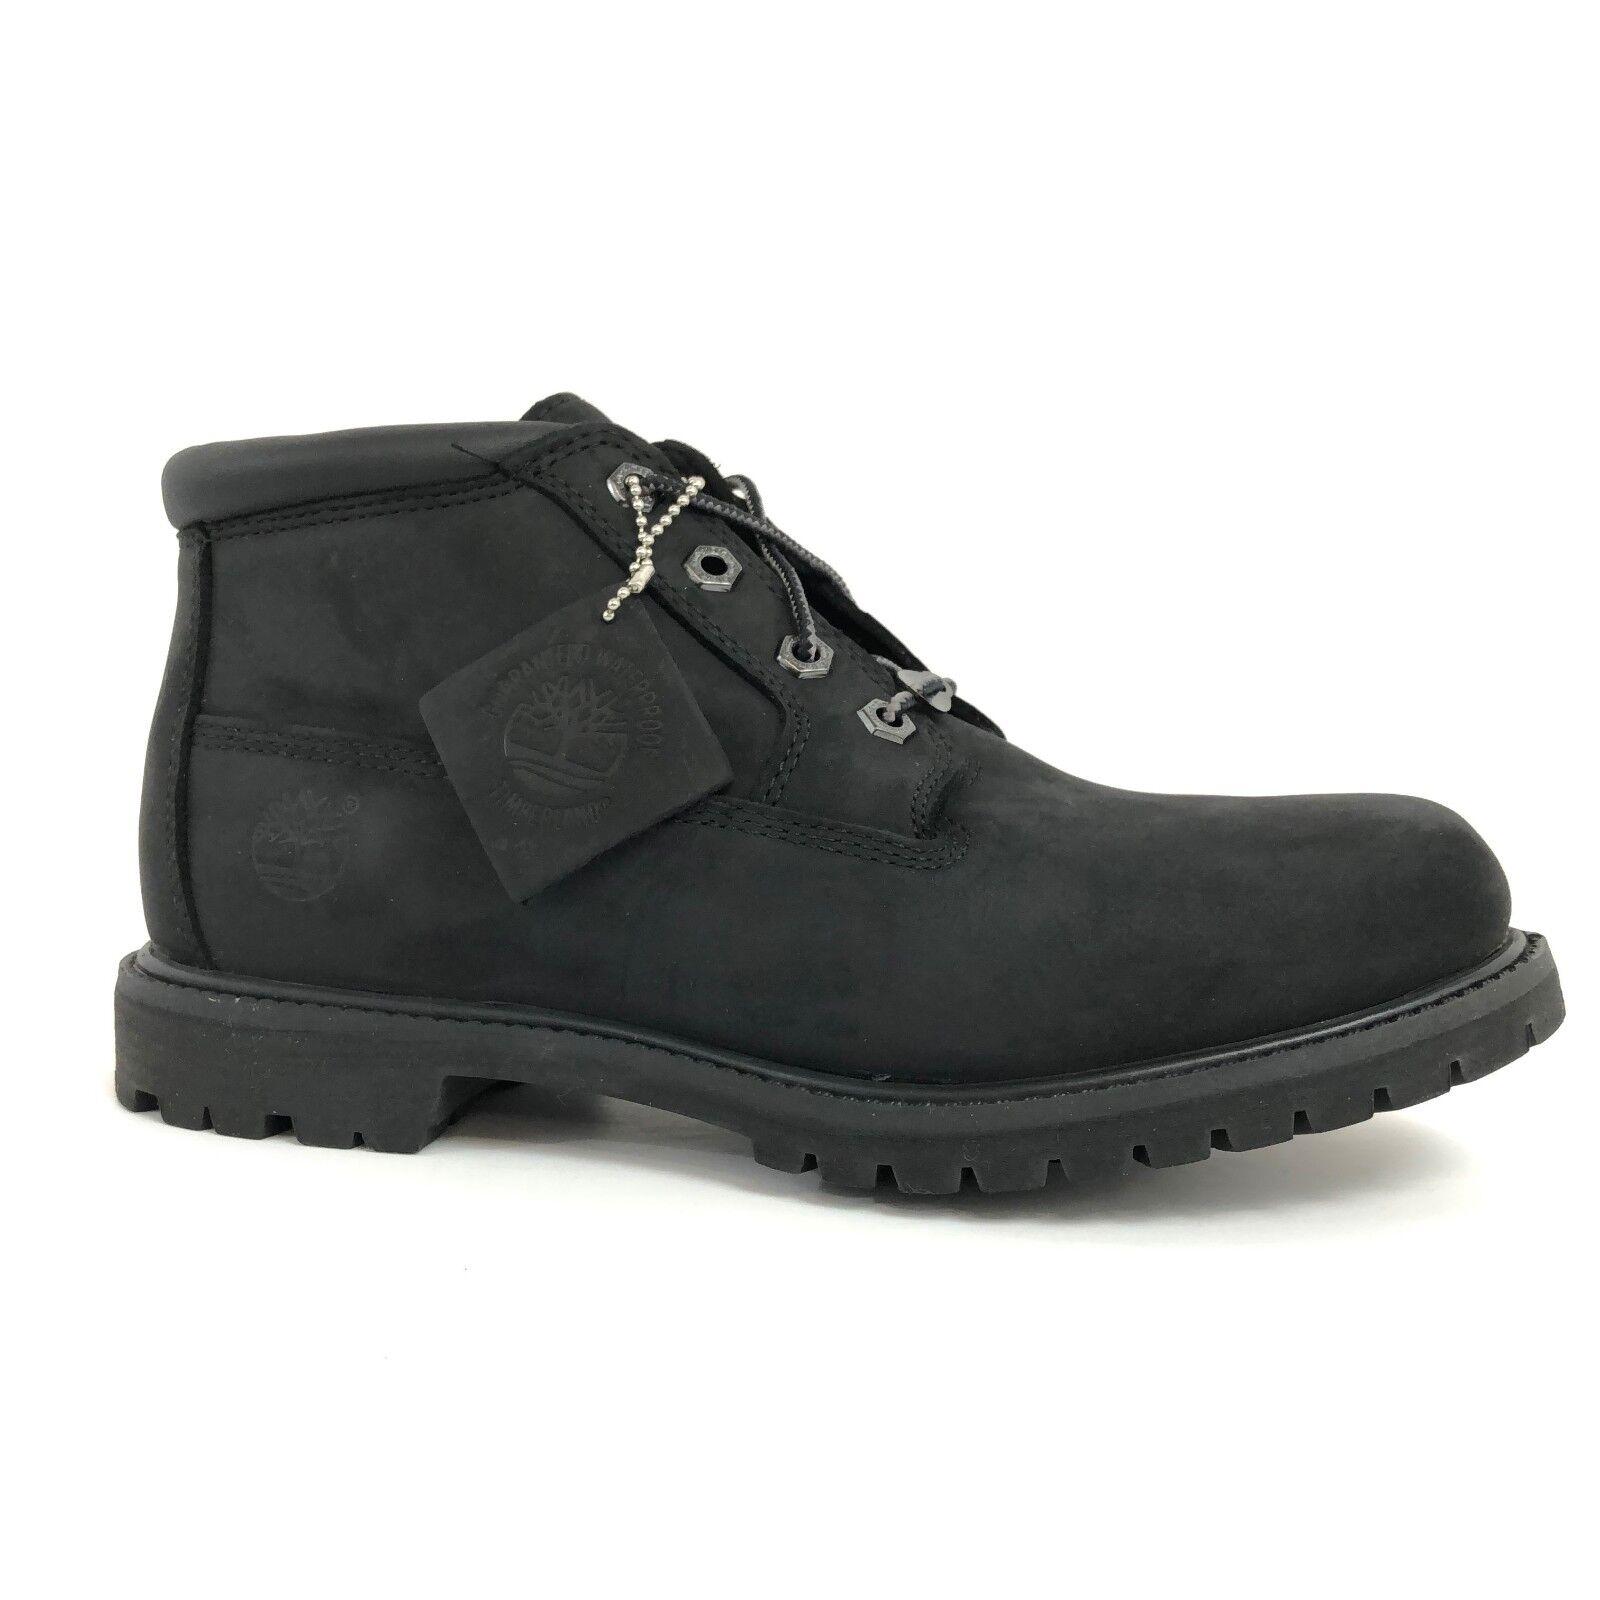 Timberland Women's Waterproof Nellie Chukka Double Black Boots 23398